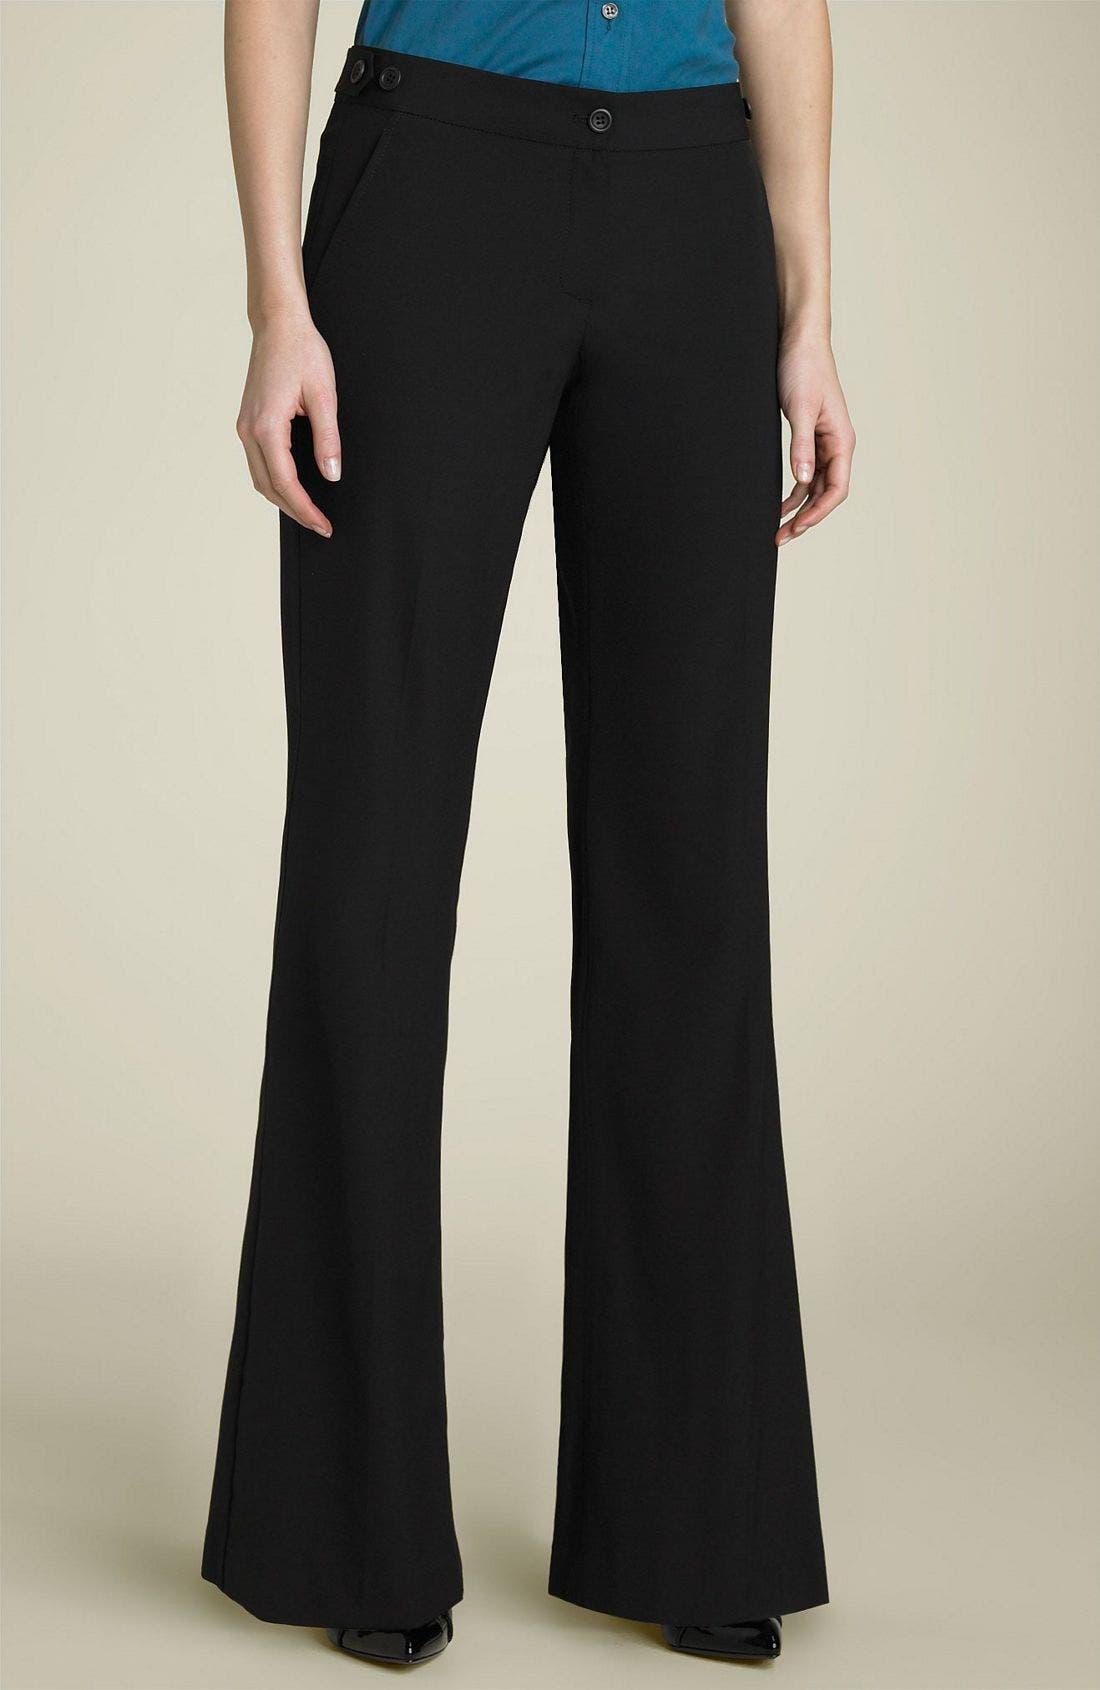 'Elkers - Pinto' Pants, Main, color, 001